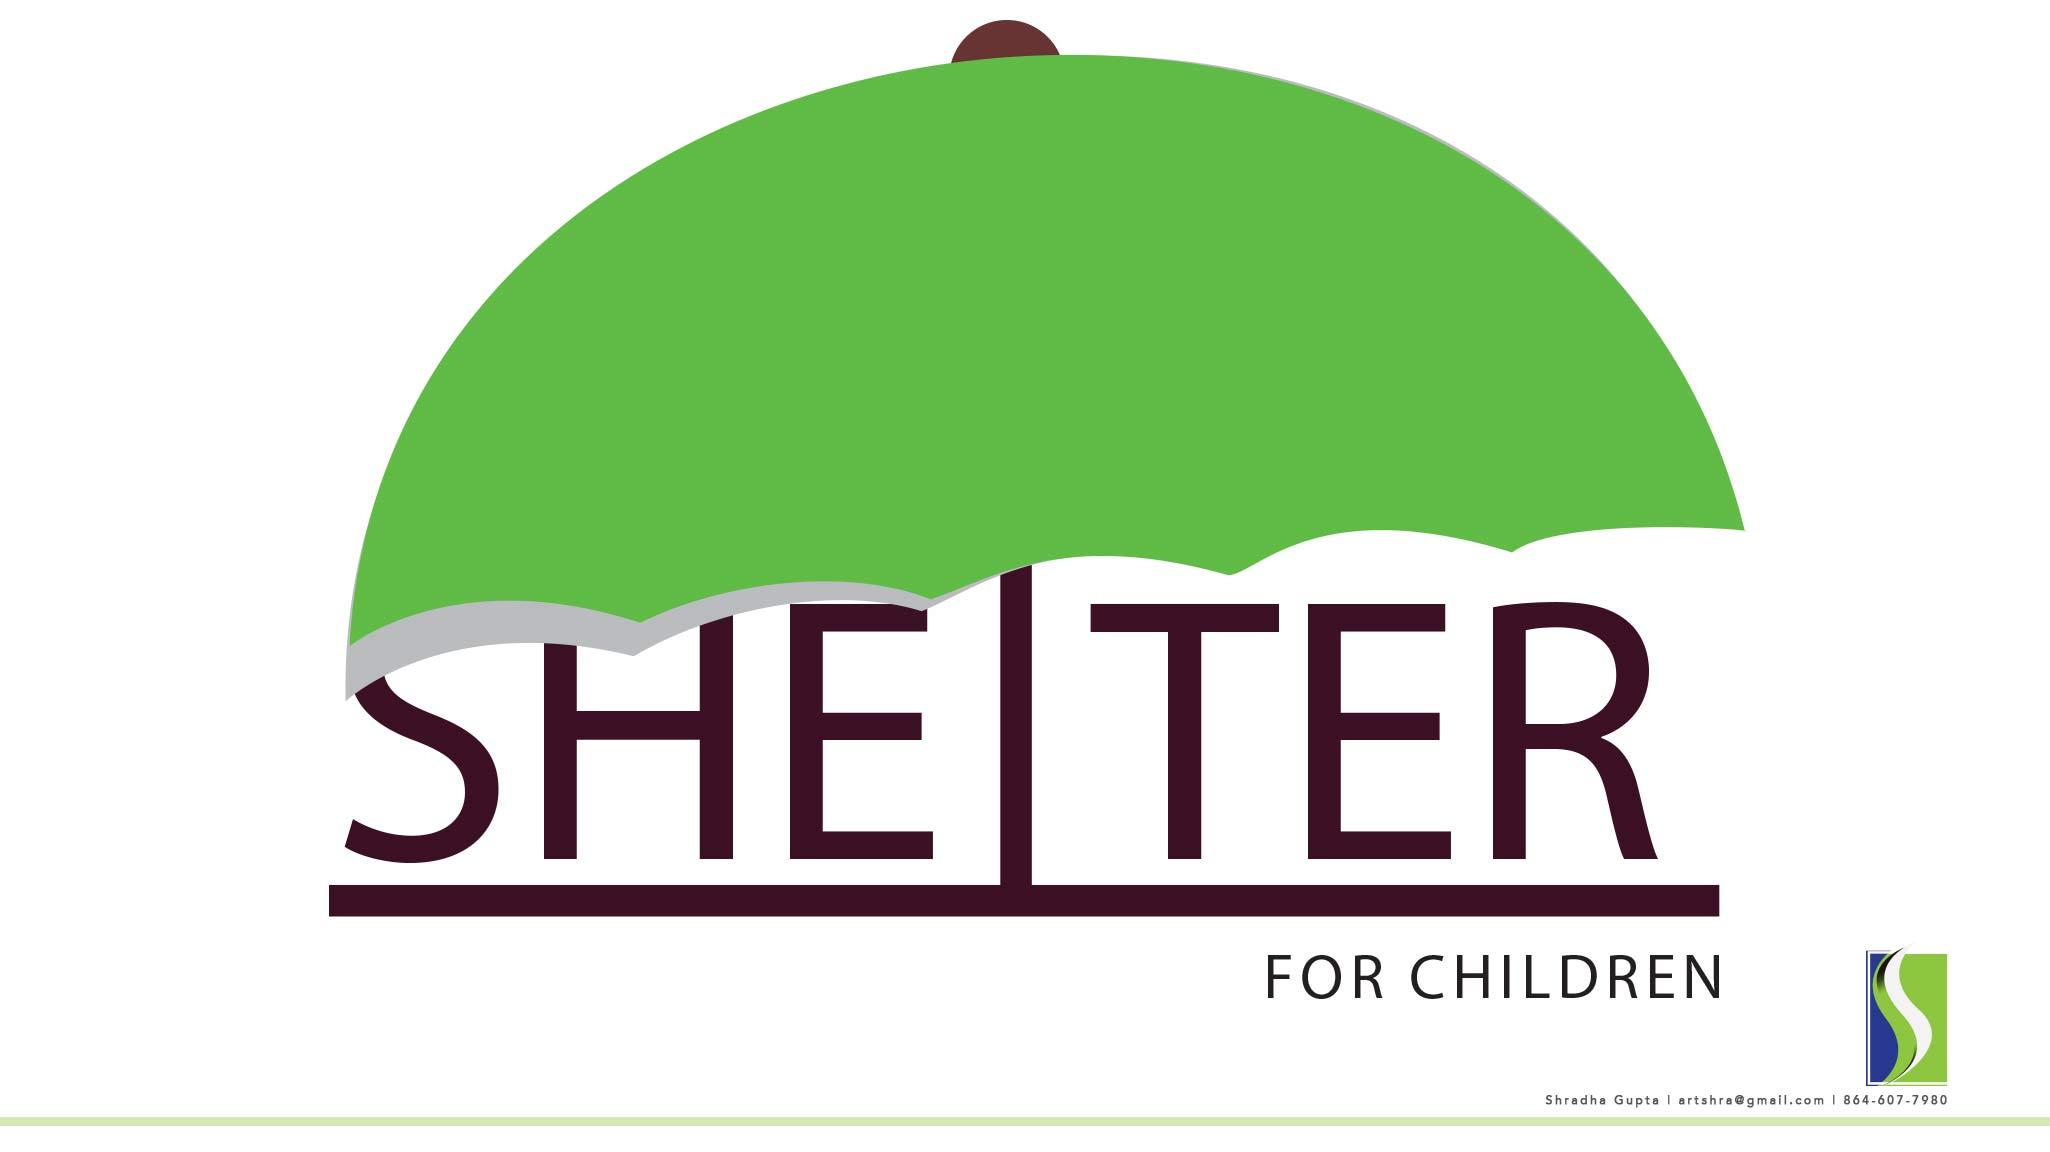 Shelter-non profit organization for children